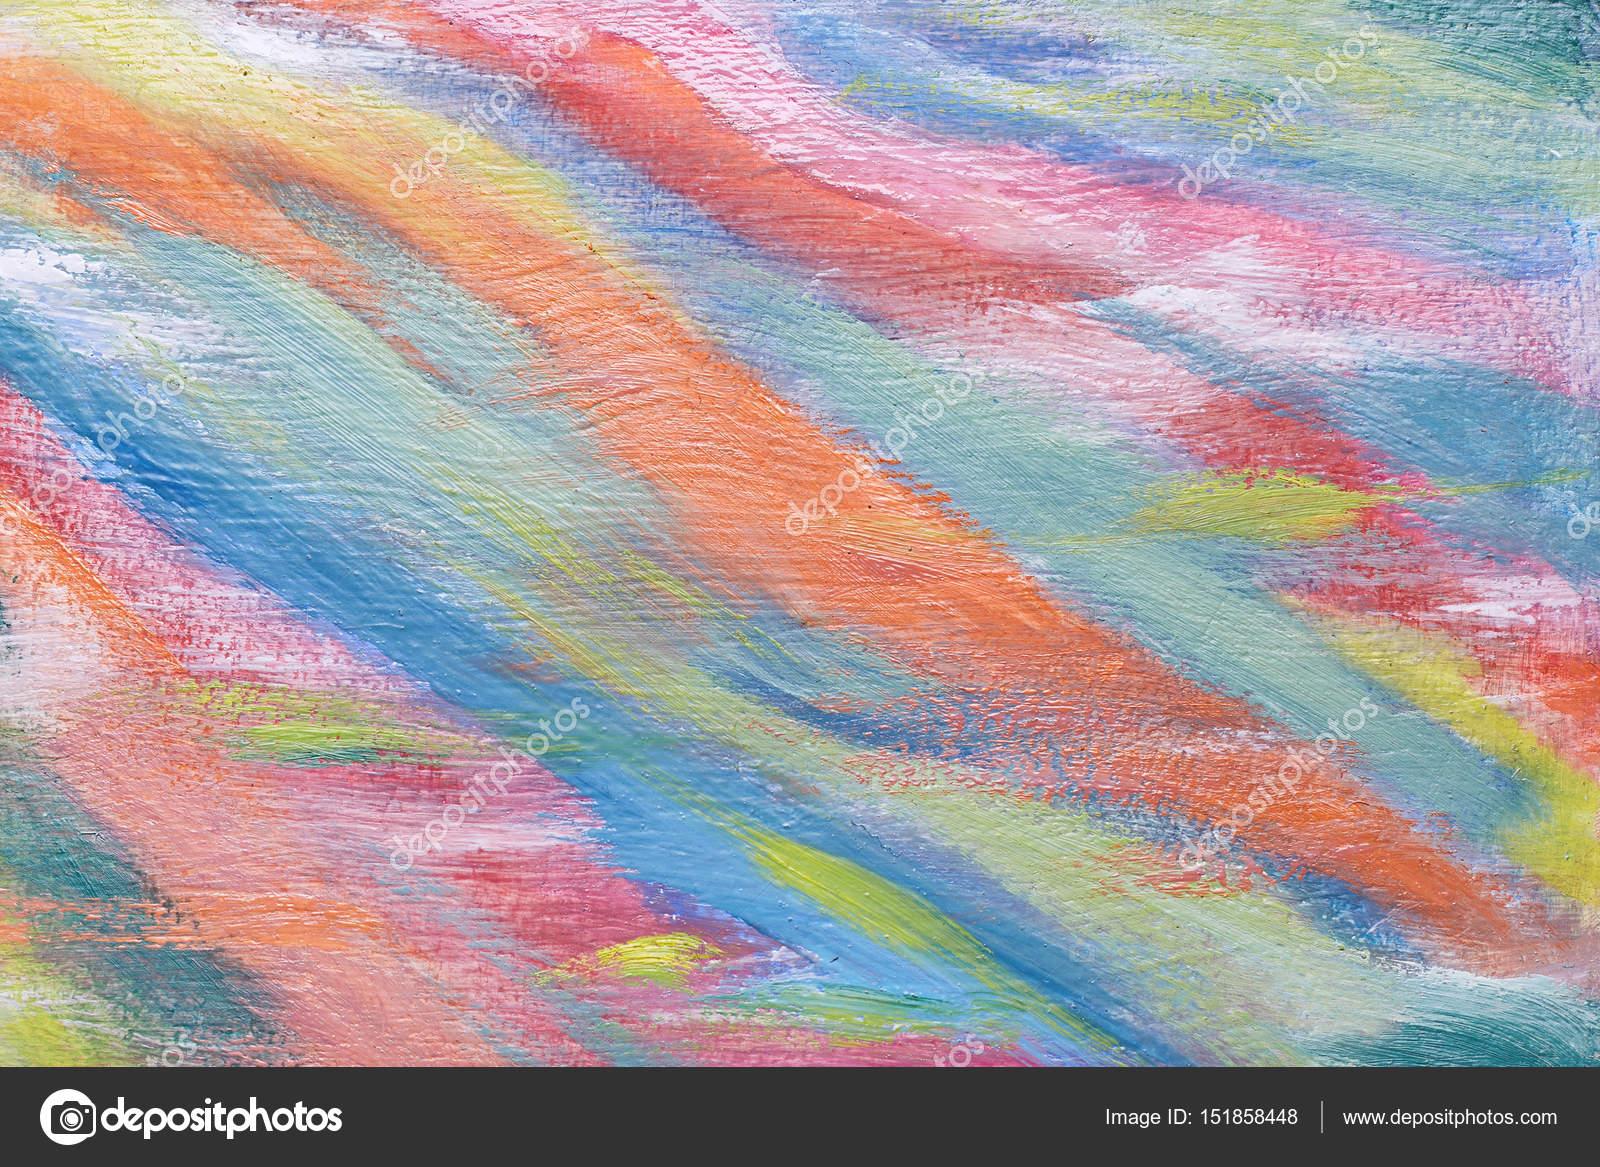 Dibujos Paisajes Dibujados Con Colores Calidos Original Pintura